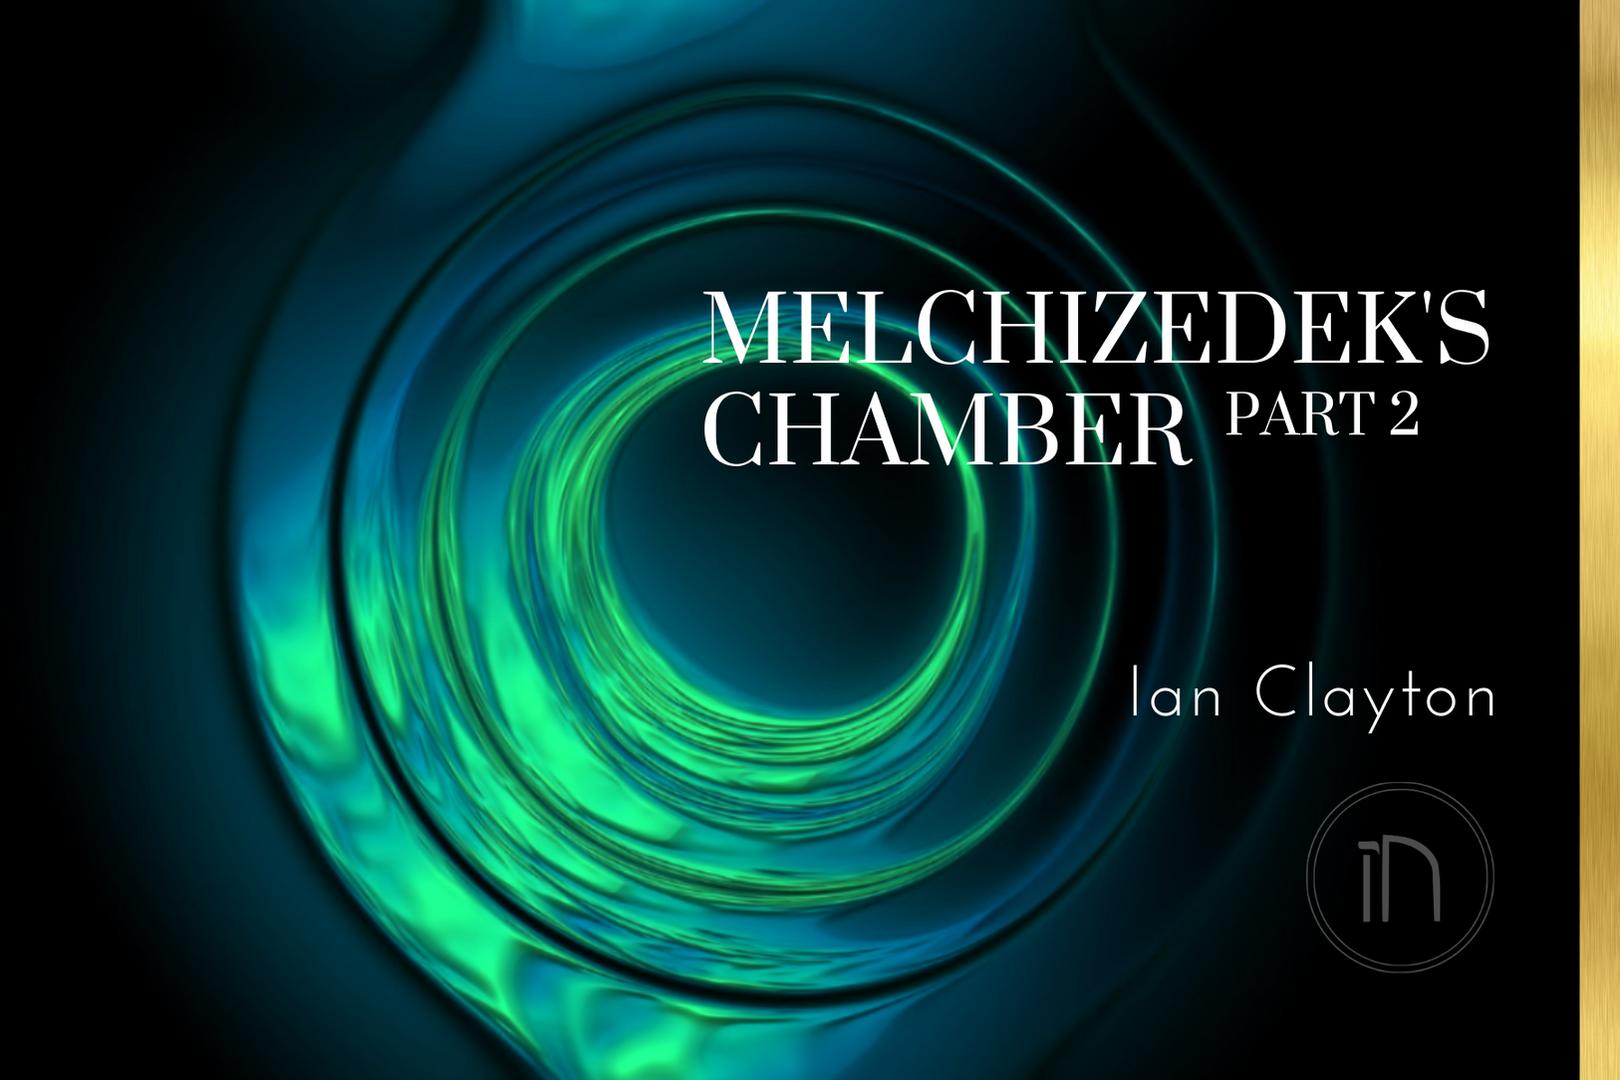 Melchizedek's Chamber